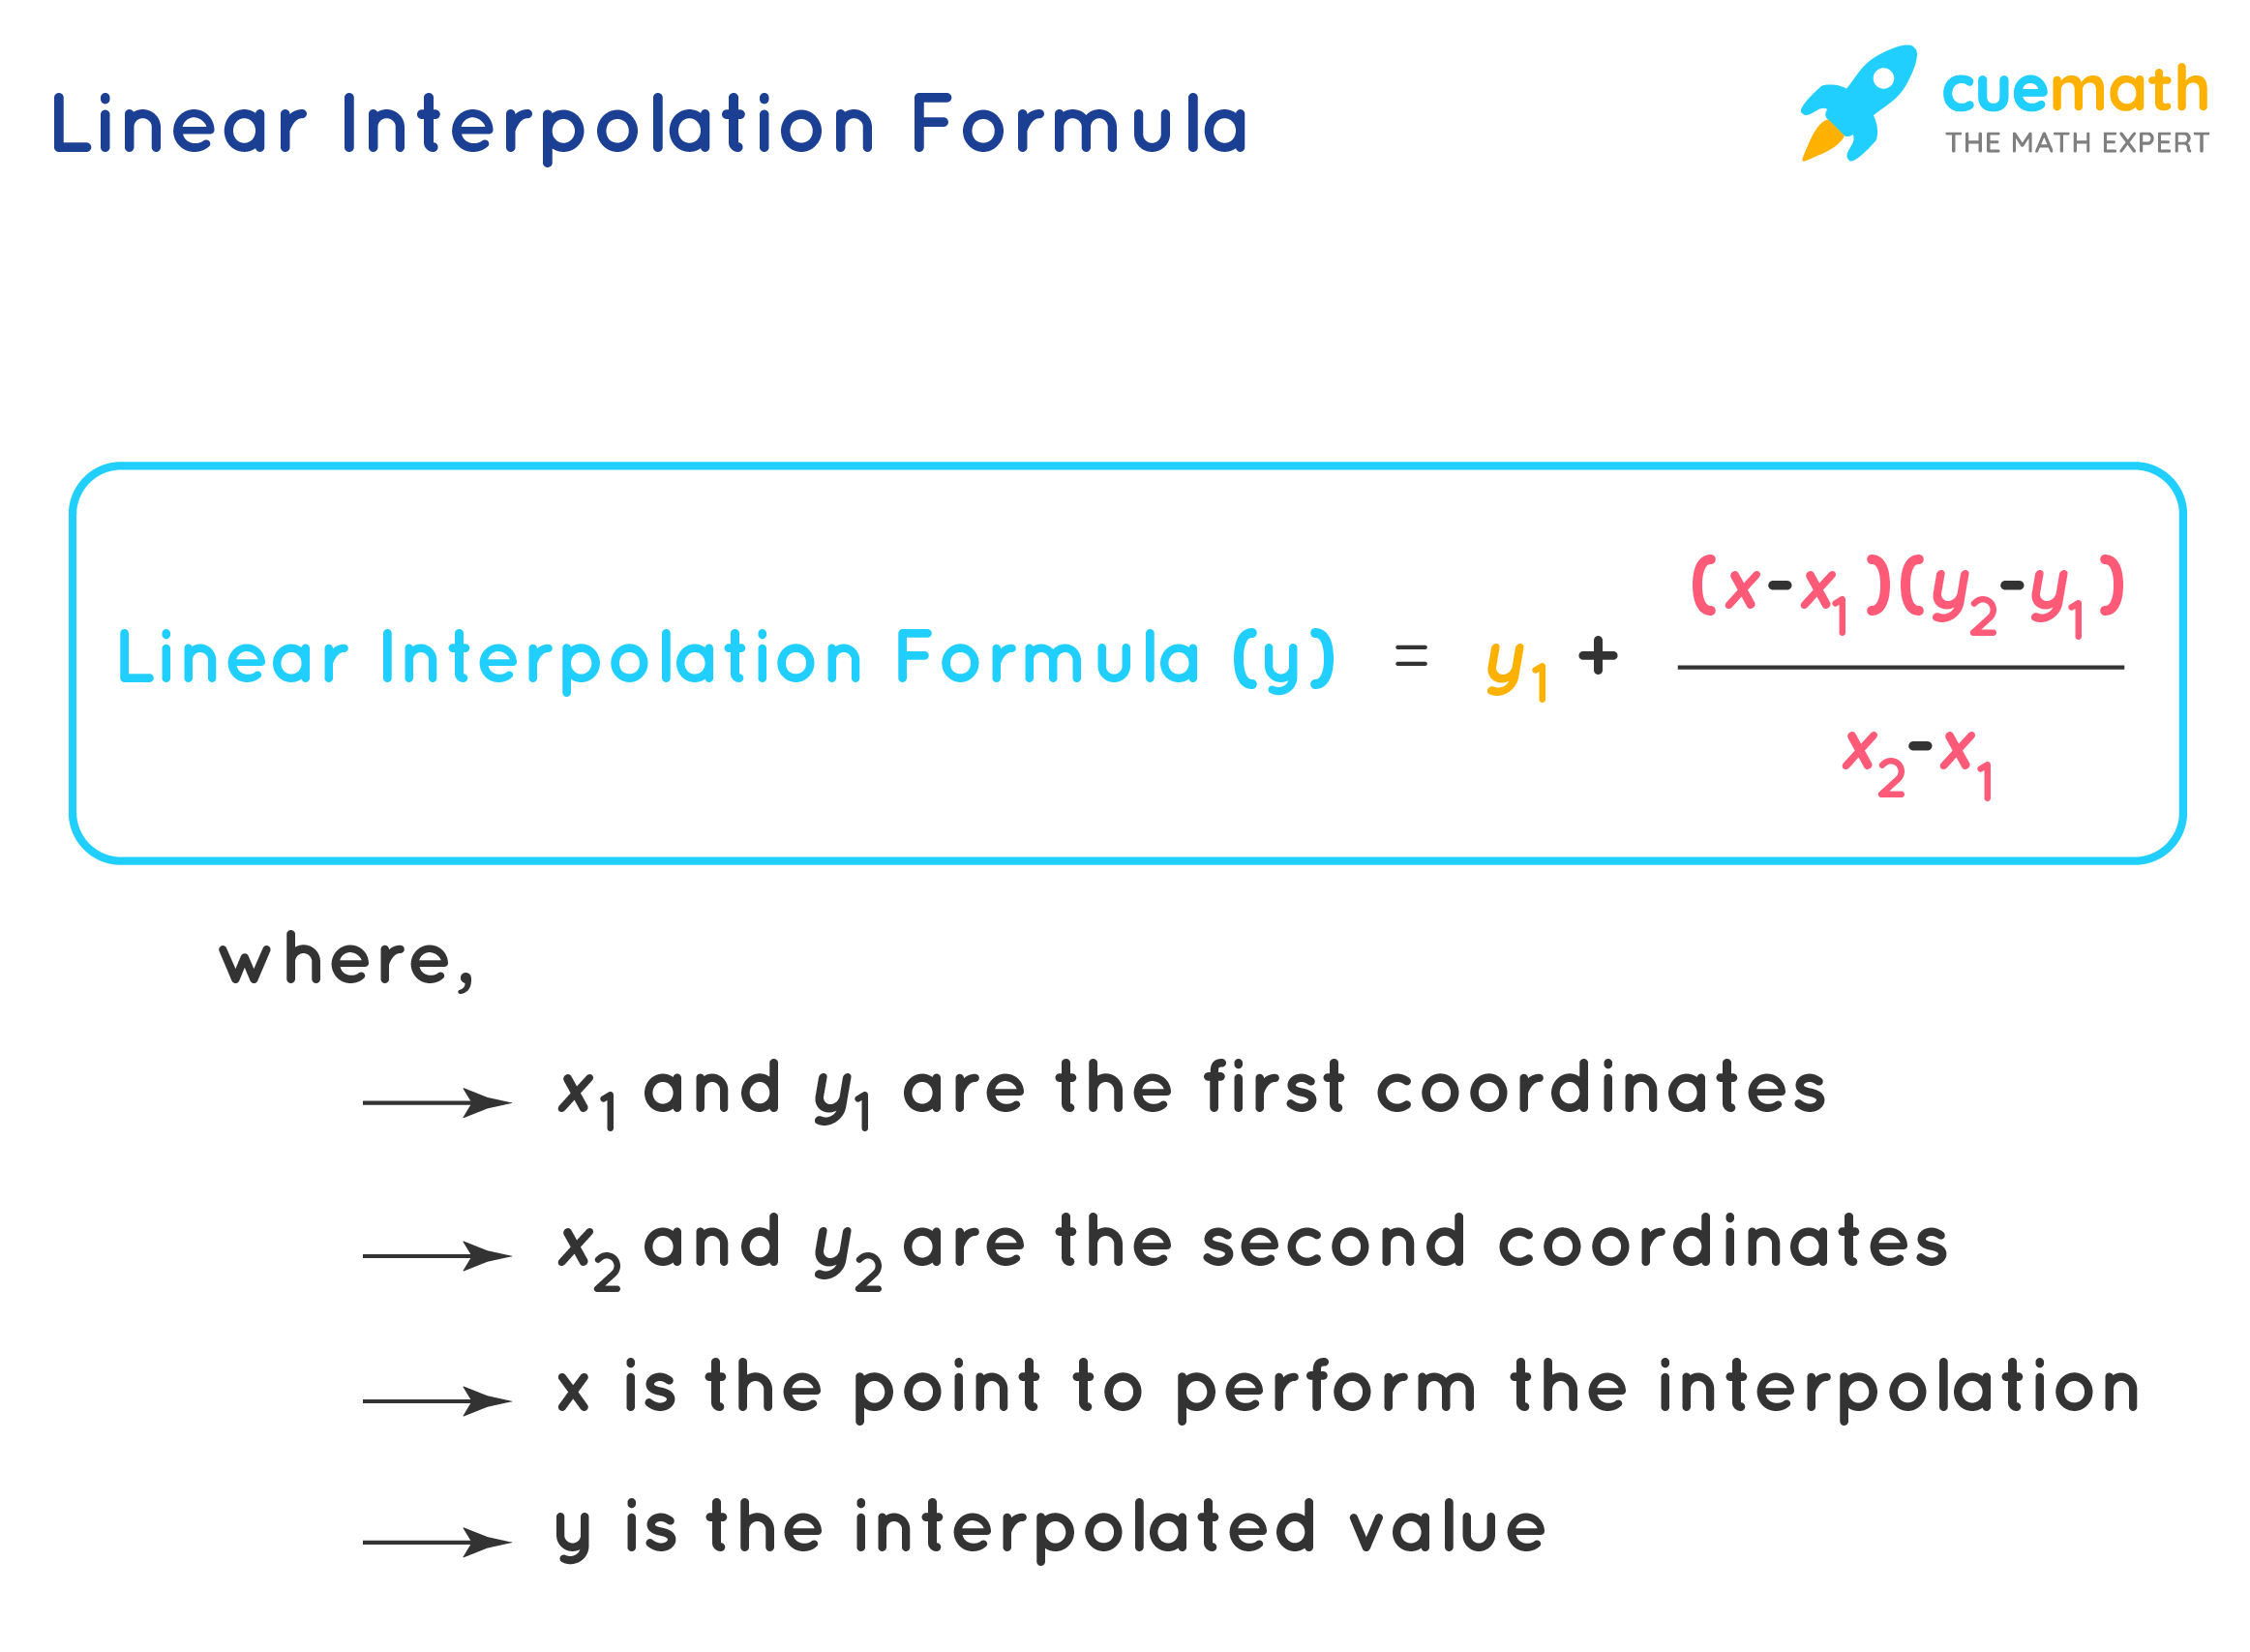 Linear Interpolation Formula